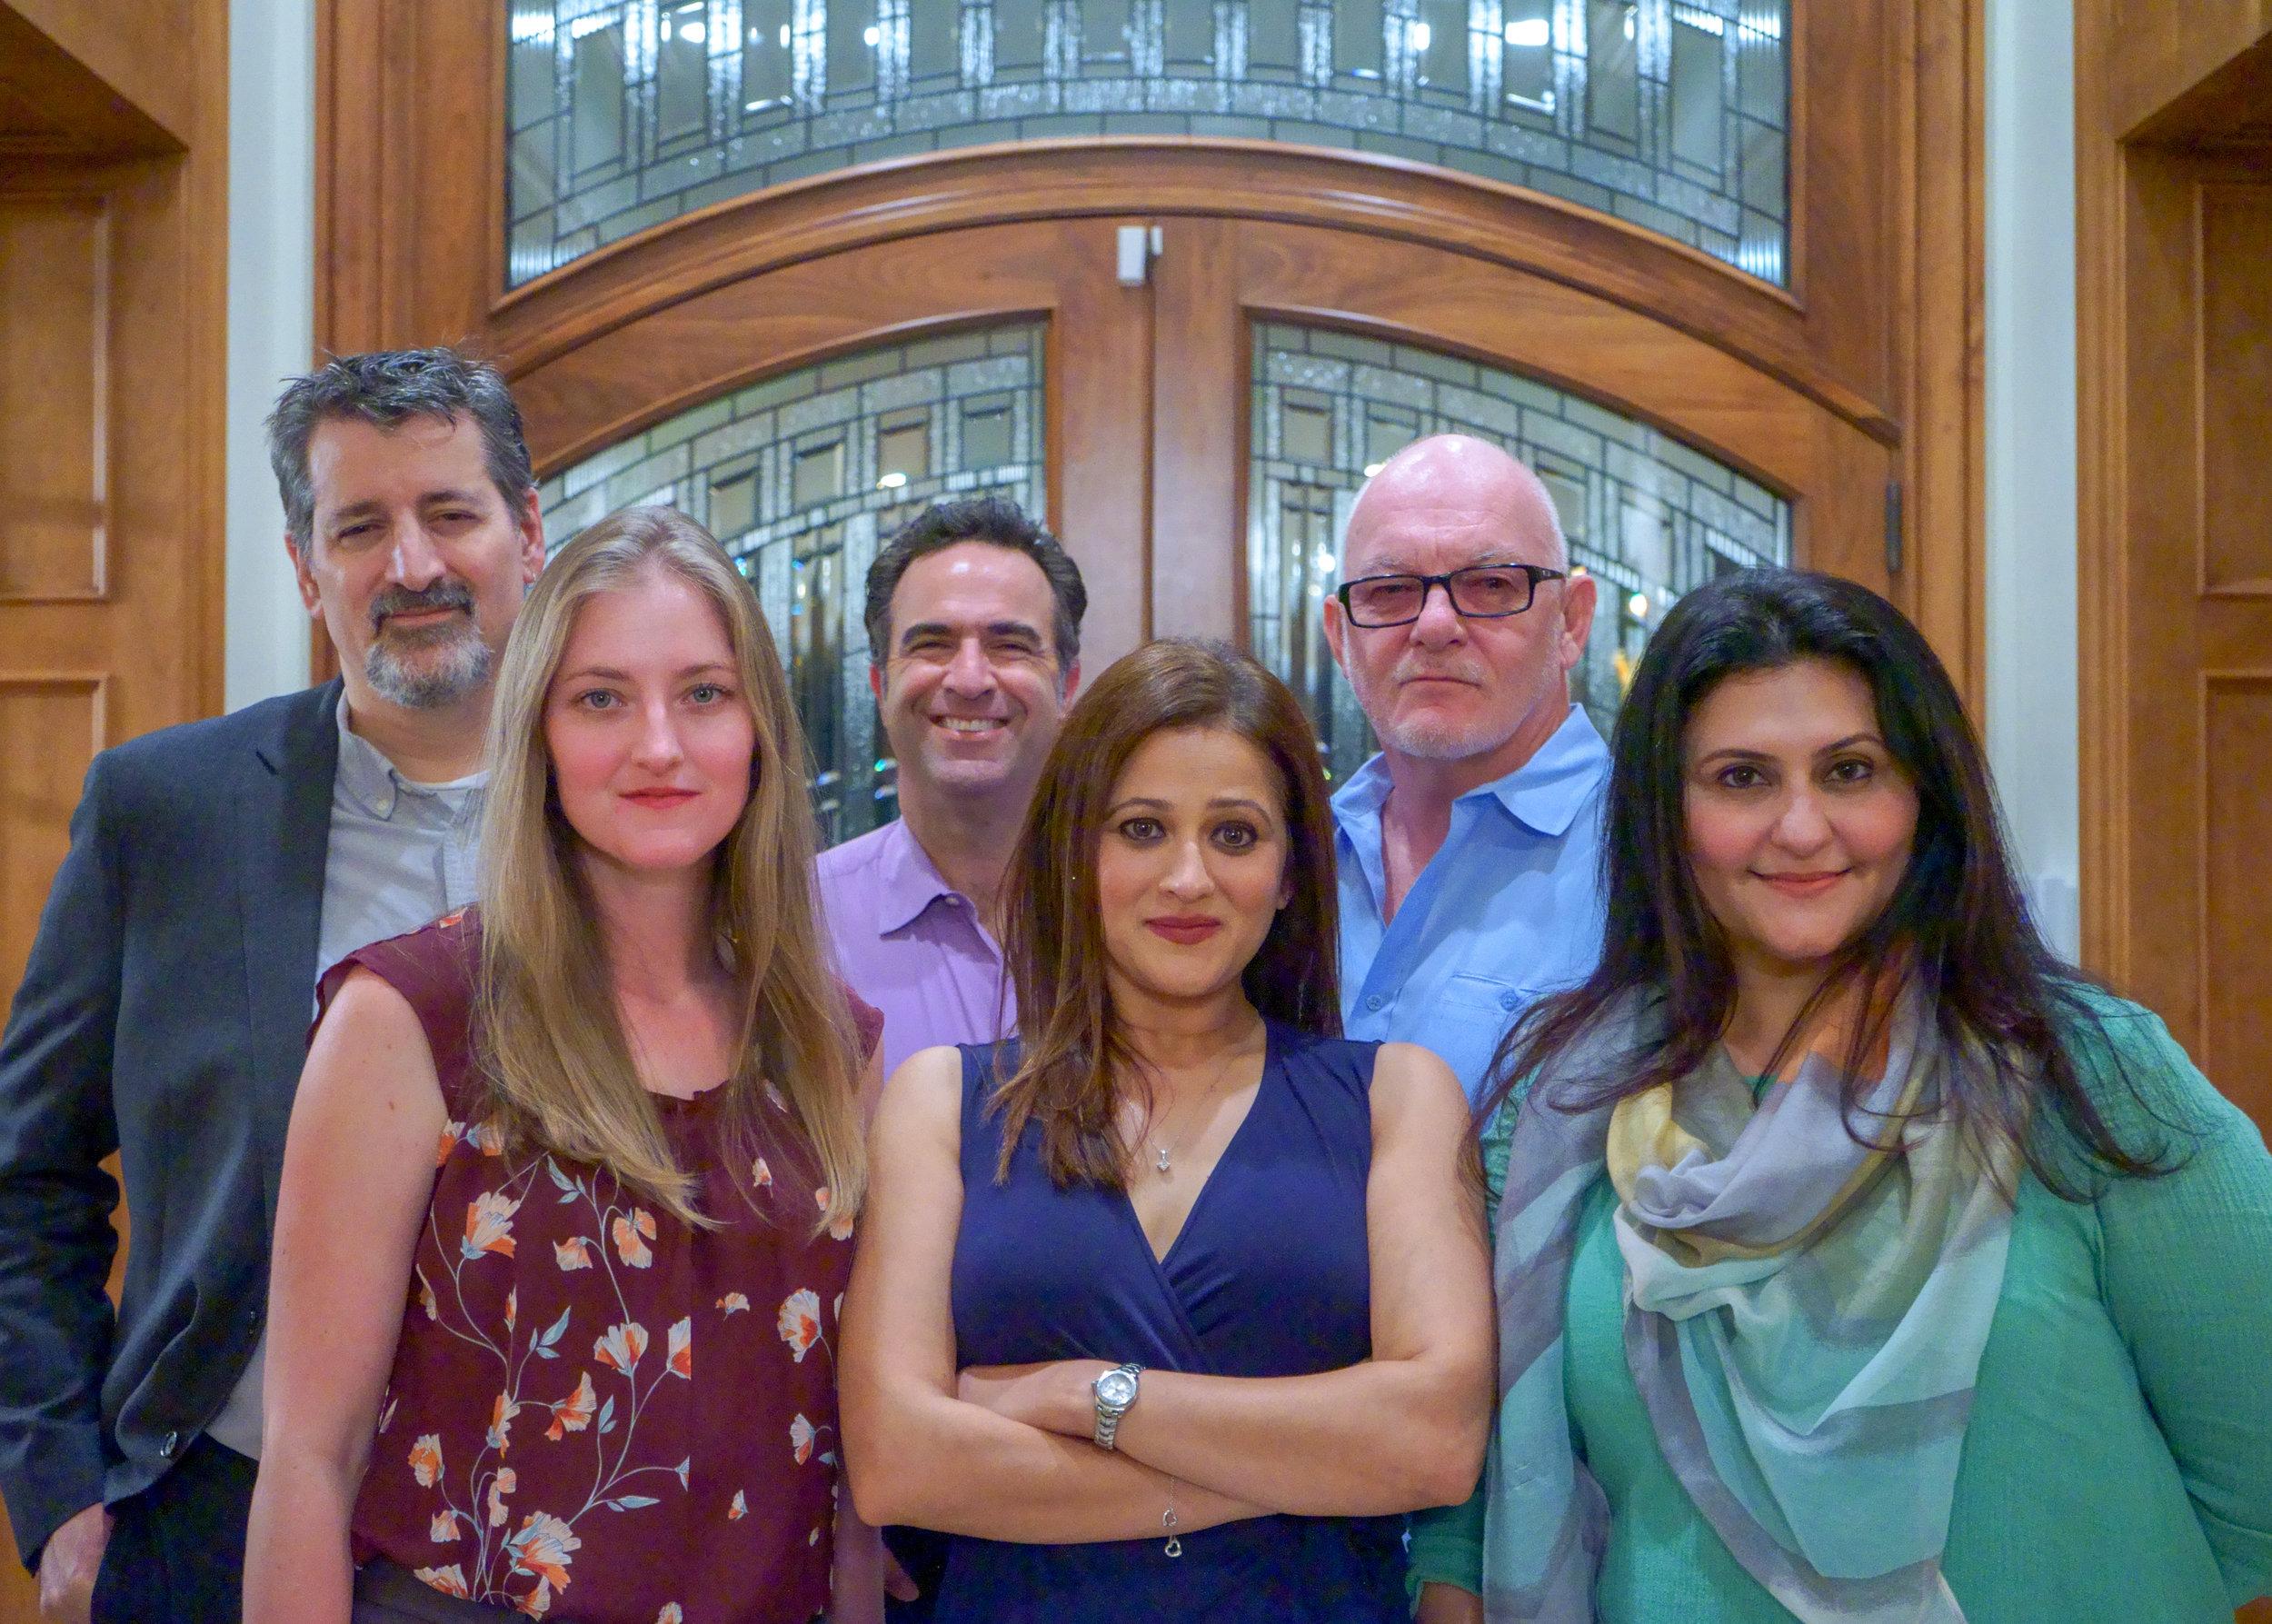 Brian Levi (Ash), Sarah Williams (Jennifer), Ed Keyani (Greg), Sindu Singh (Roma), Paul Costello (Jeremy) and Rita Bhatia (Sumitra)